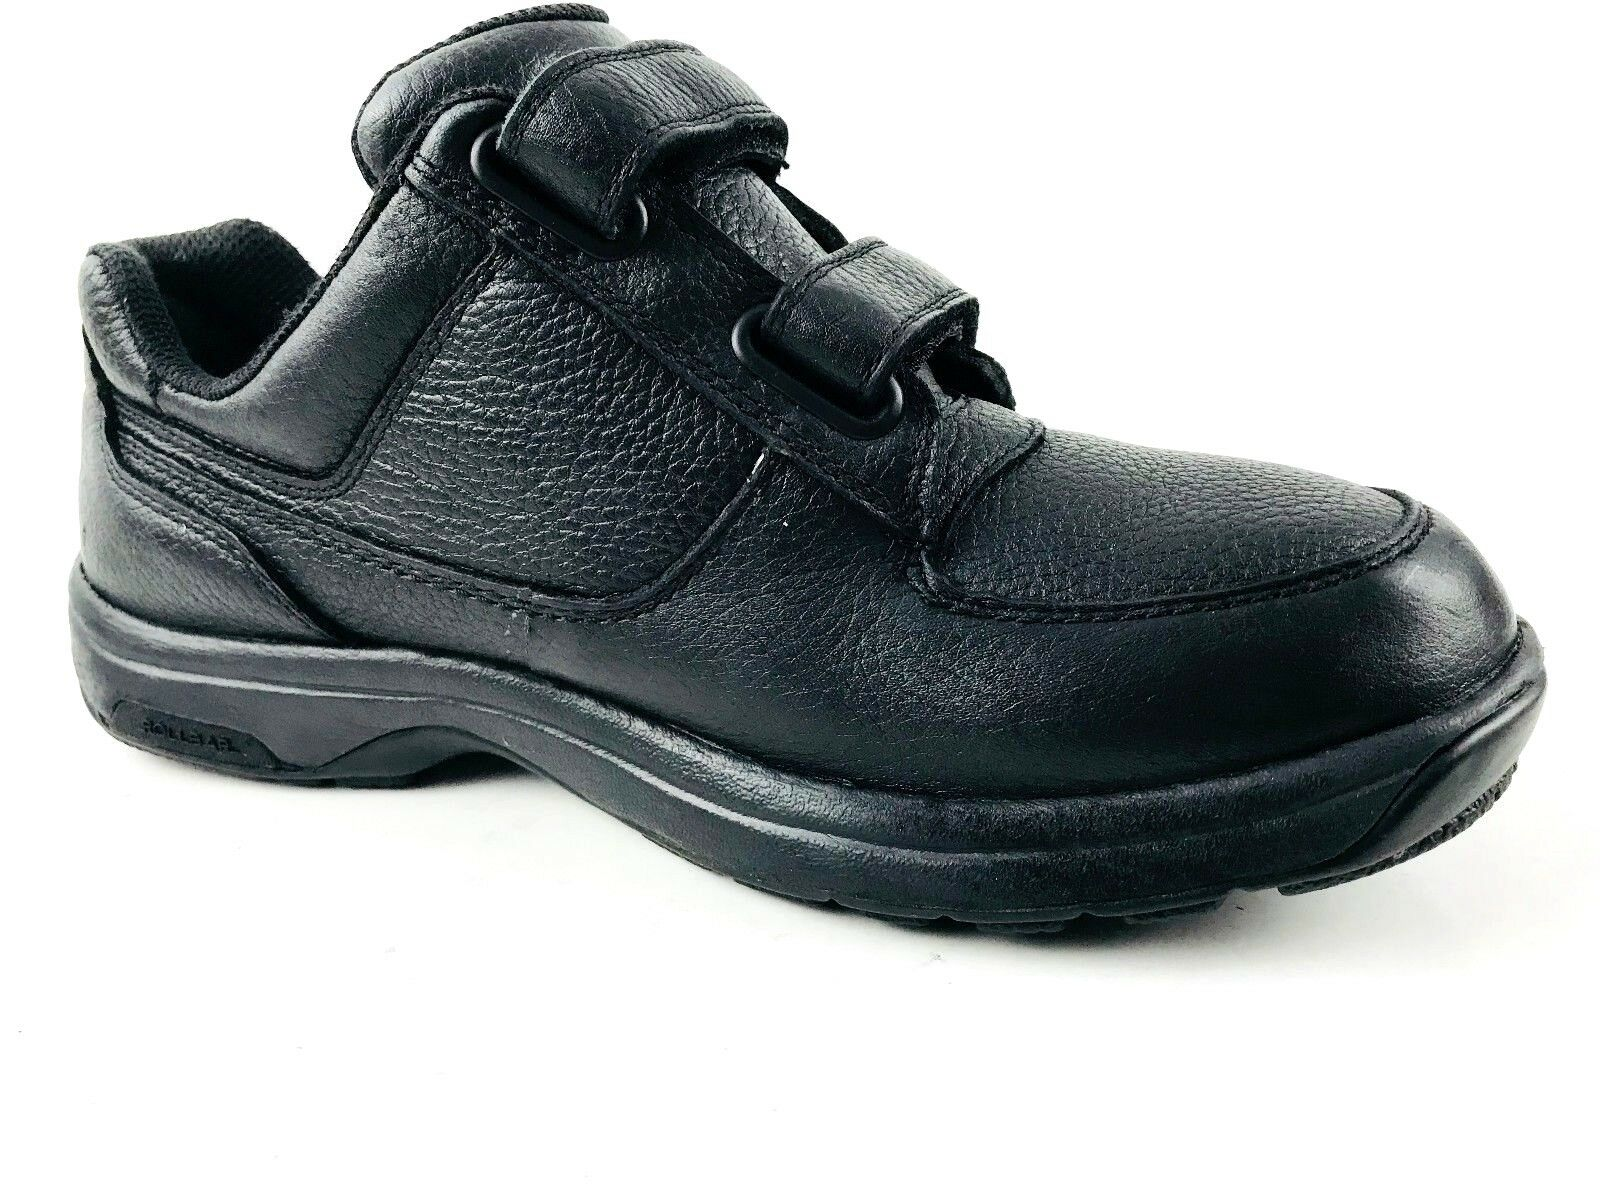 Dunham Winslow Oxford Velcro Oxford Leather Black shoes Size US.8 UK.41 EU.7.5